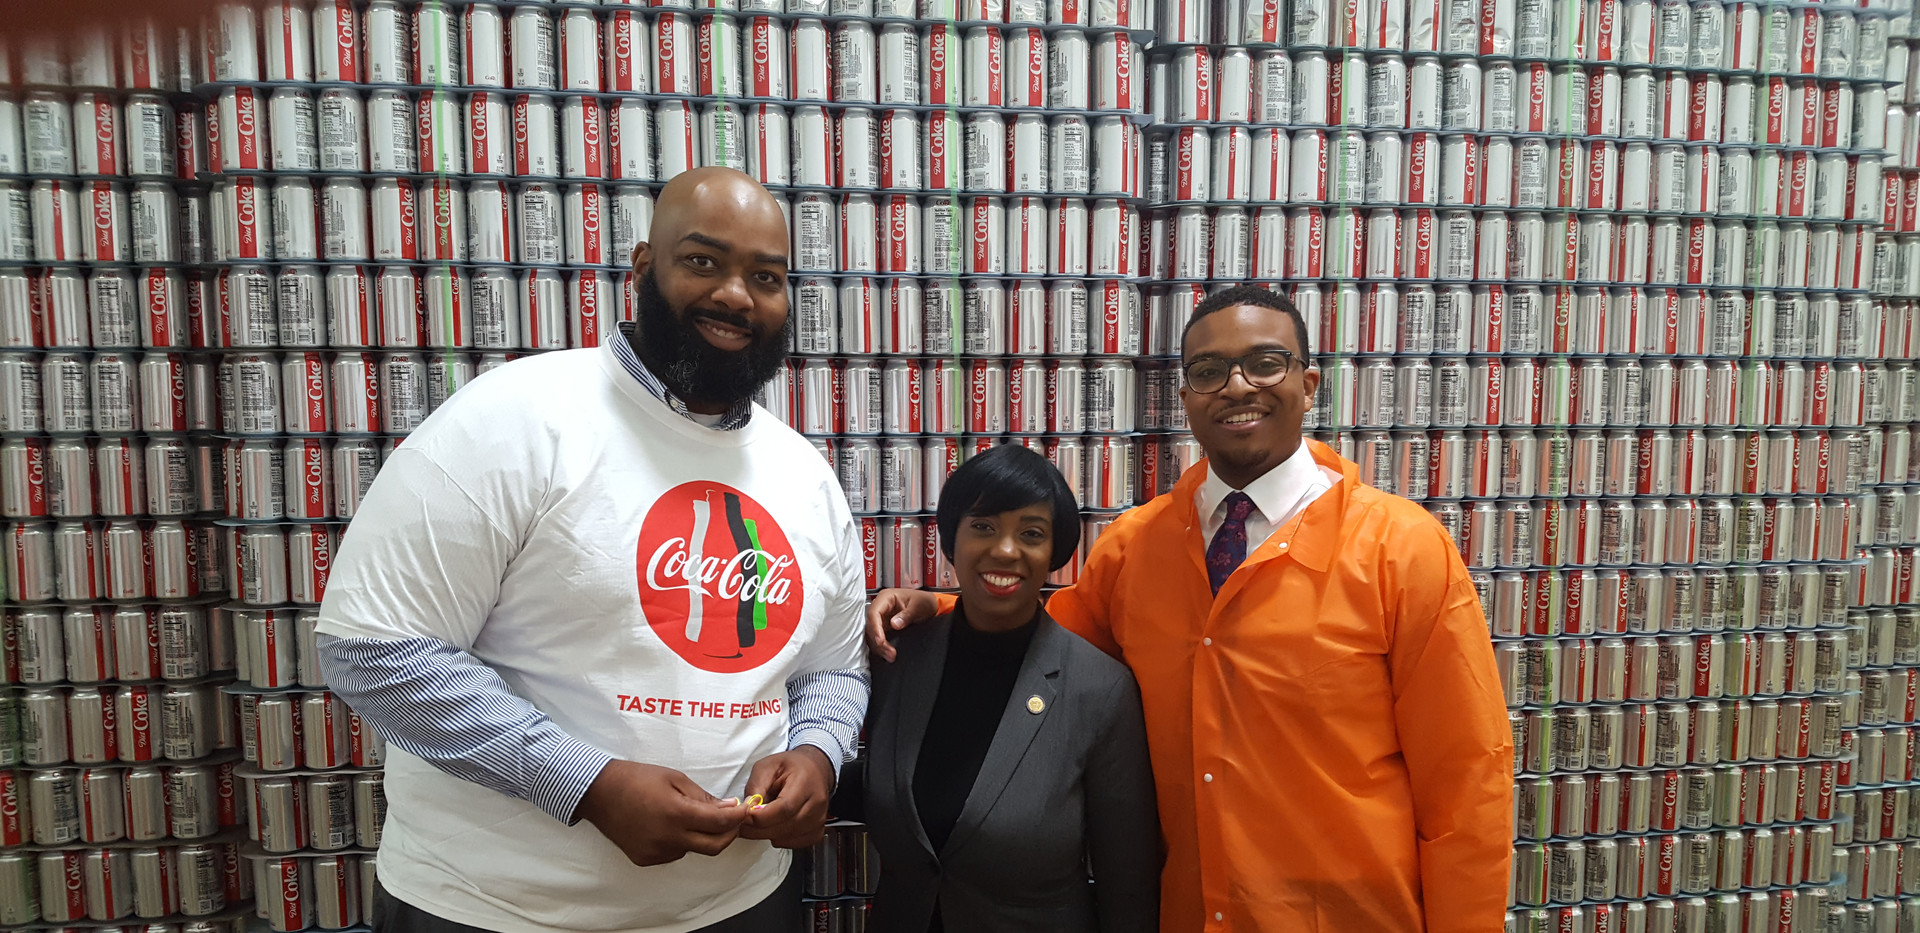 Delegates Lashresce Aird (D-Petersburg) and Lamont Bagby (D-Henrico) Visit Coca-Cola Sandston